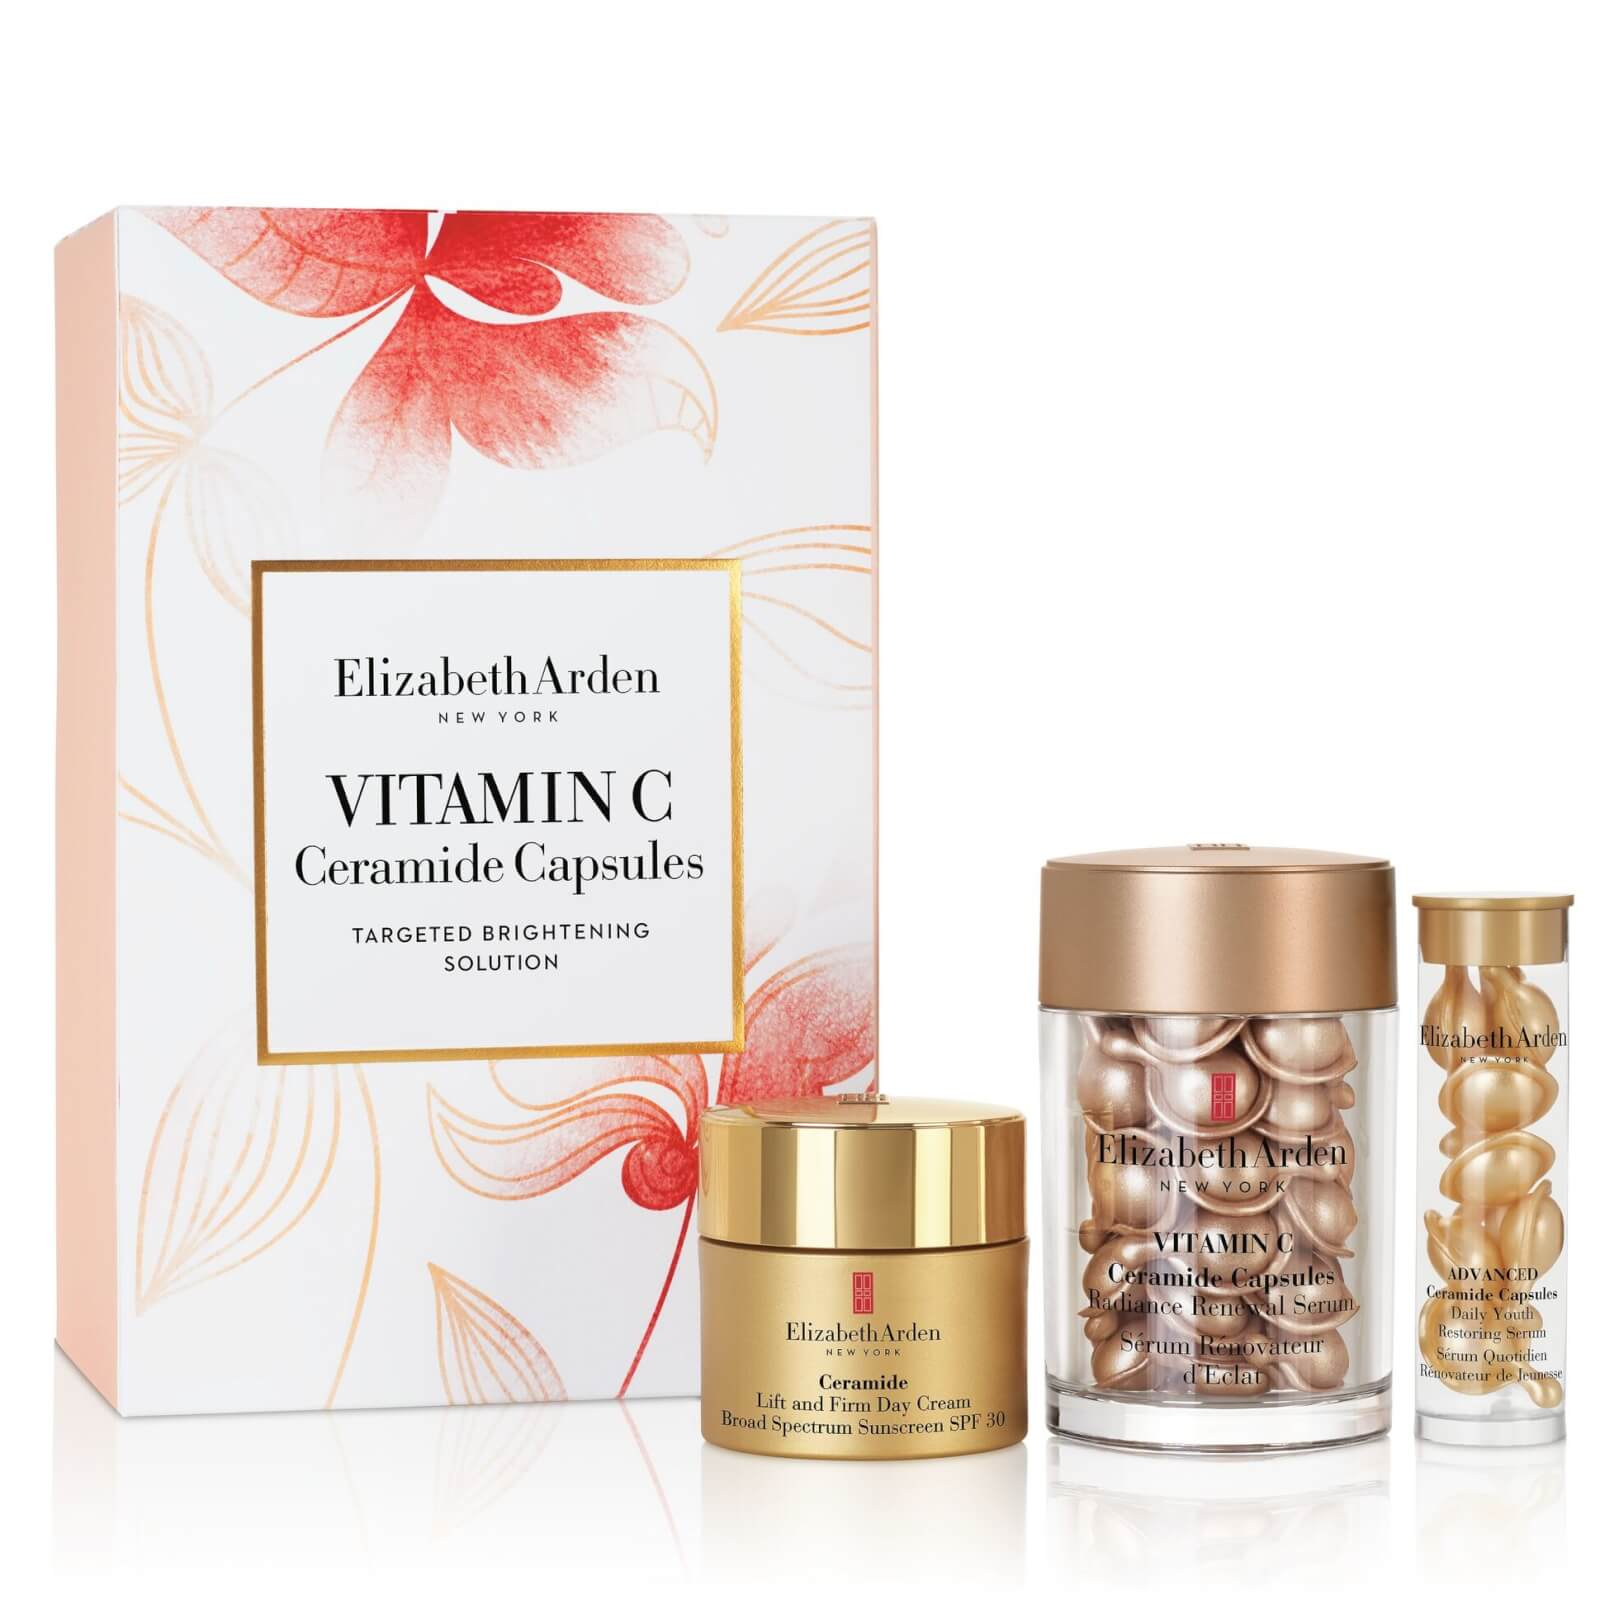 Купить Elizabeth Arden Ceramide Vitamin C Capsule Set